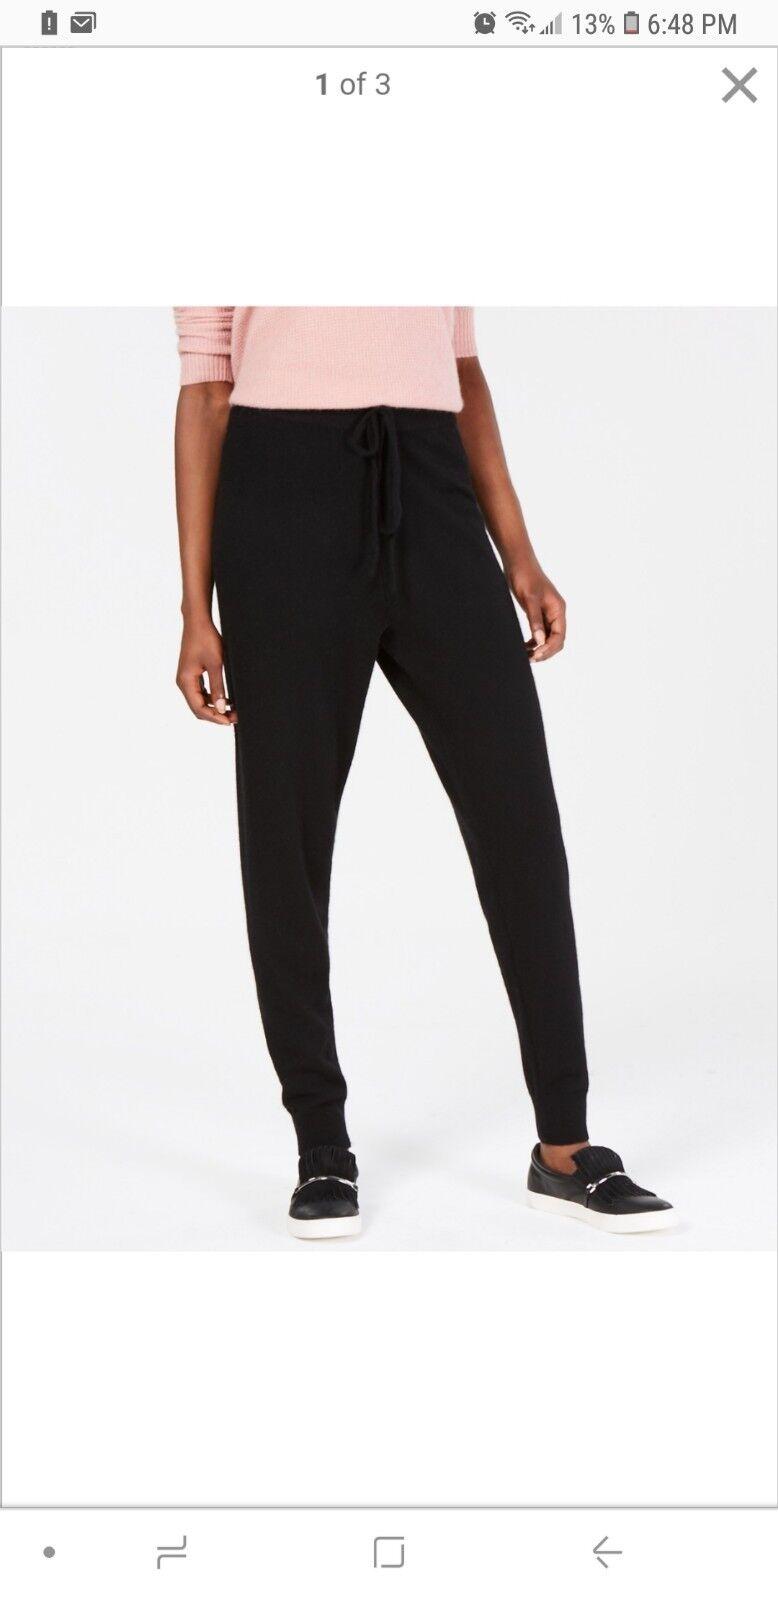 Cashmere Clud pants